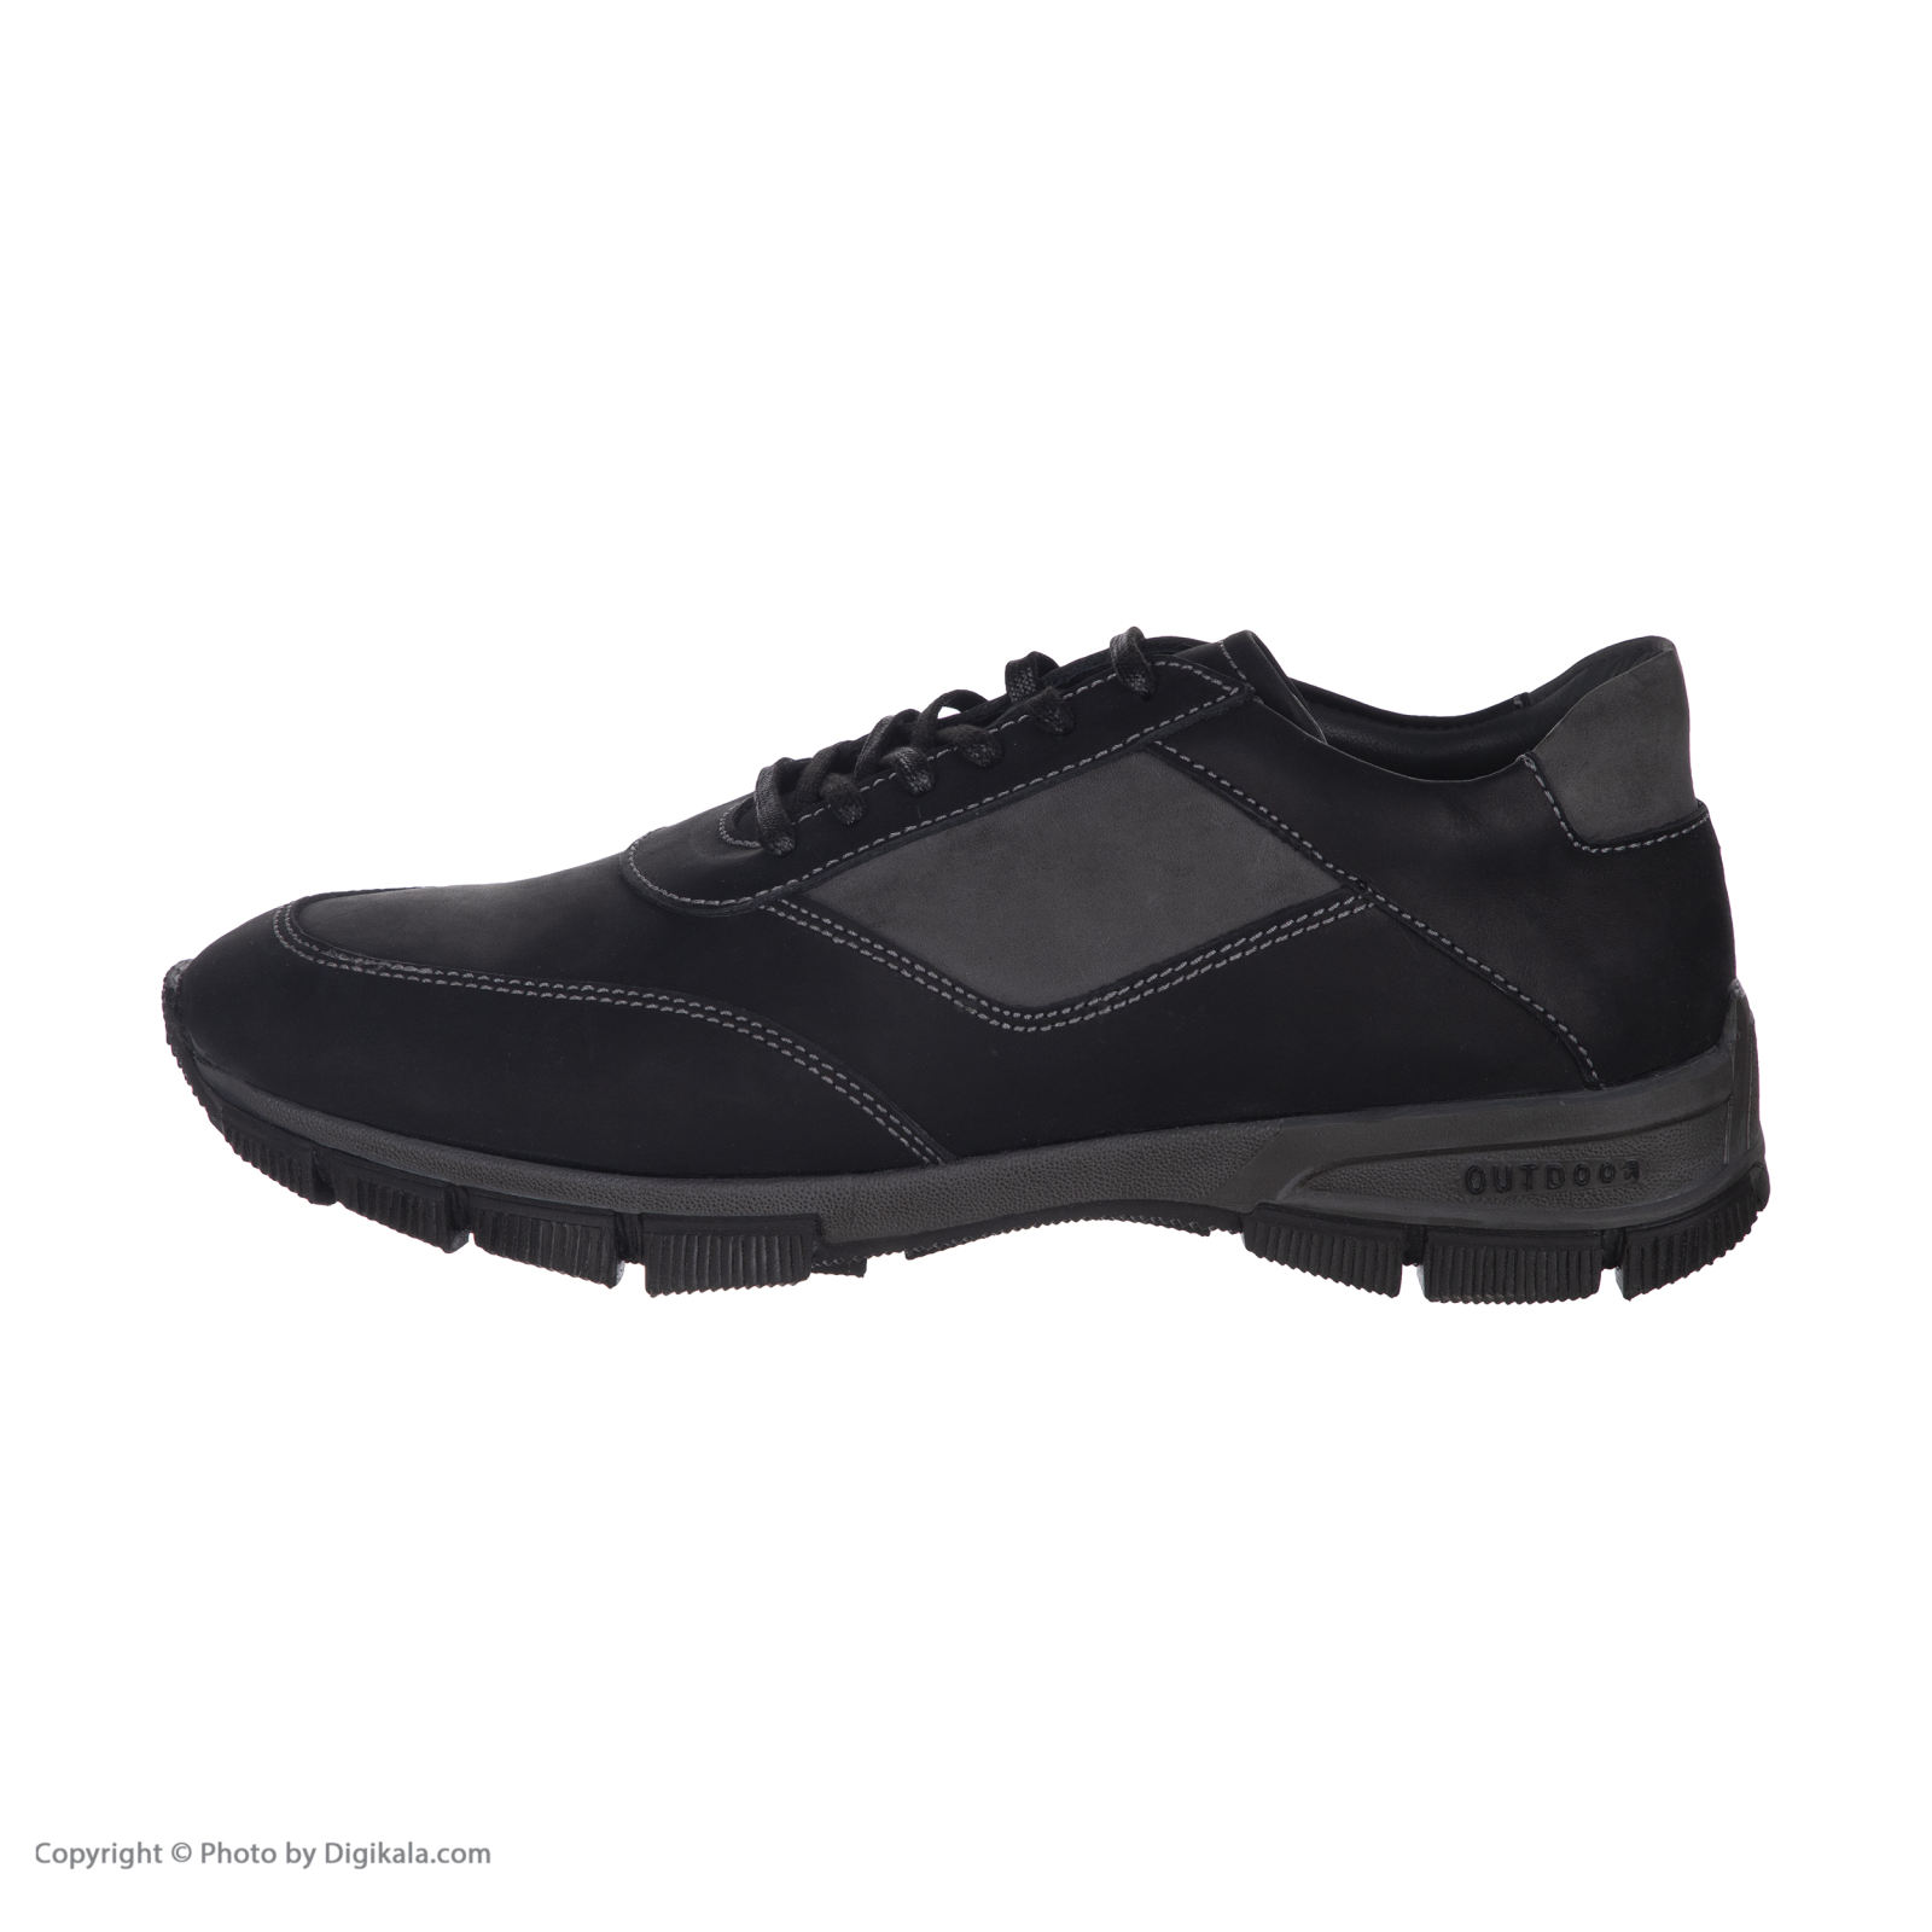 کفش روزمره مردانه دانادل مدل 8604C503101 -  - 1